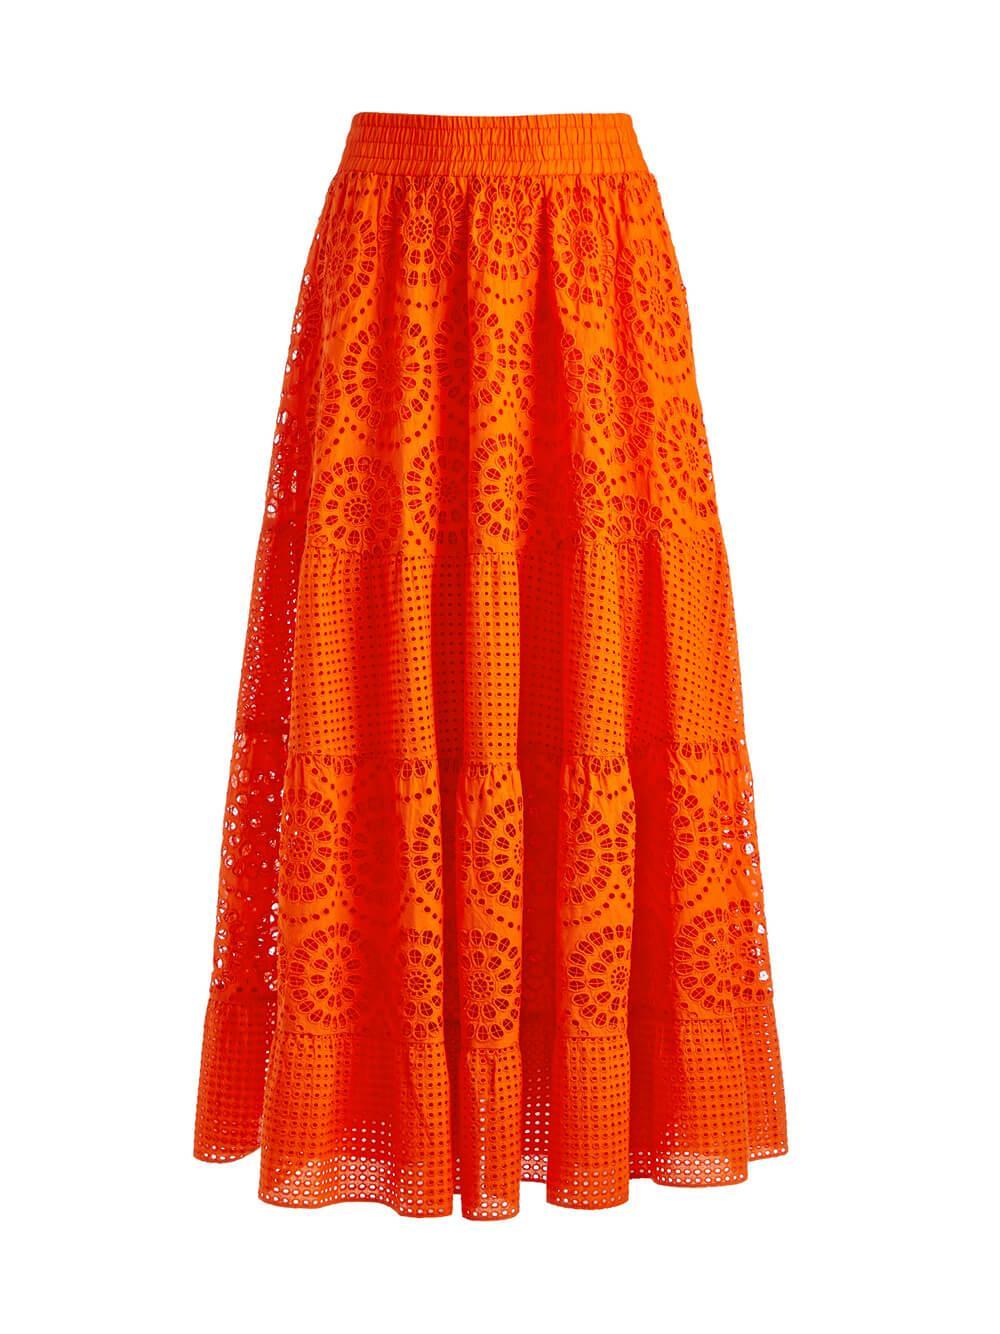 Melony Eyelet Skirt